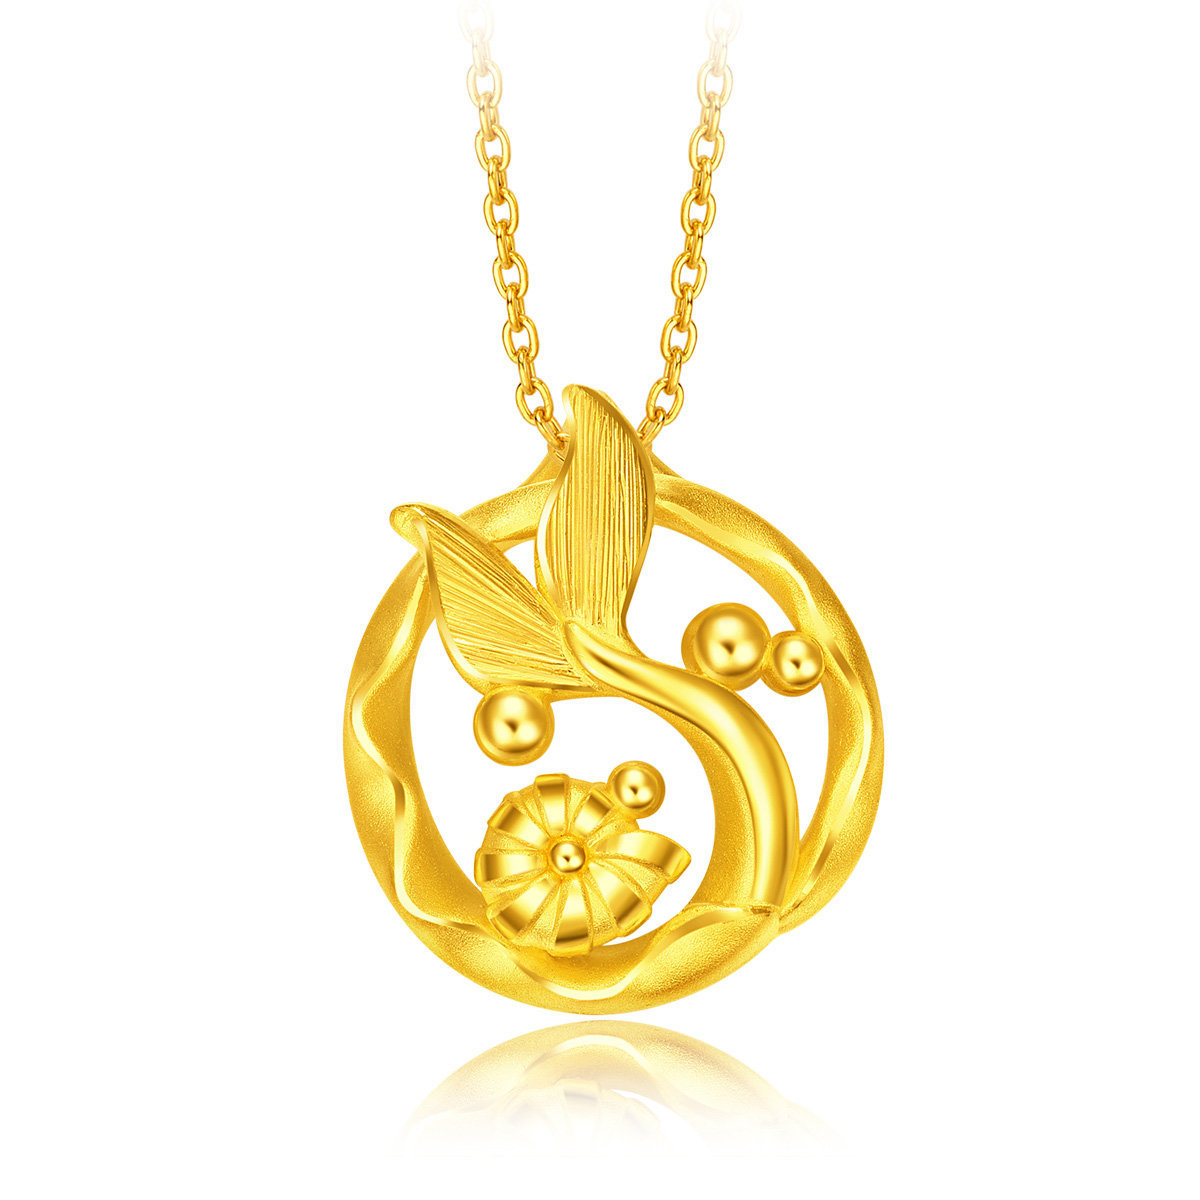 Disney Princess Collection: Little Mermaid 999 Gold Pendant